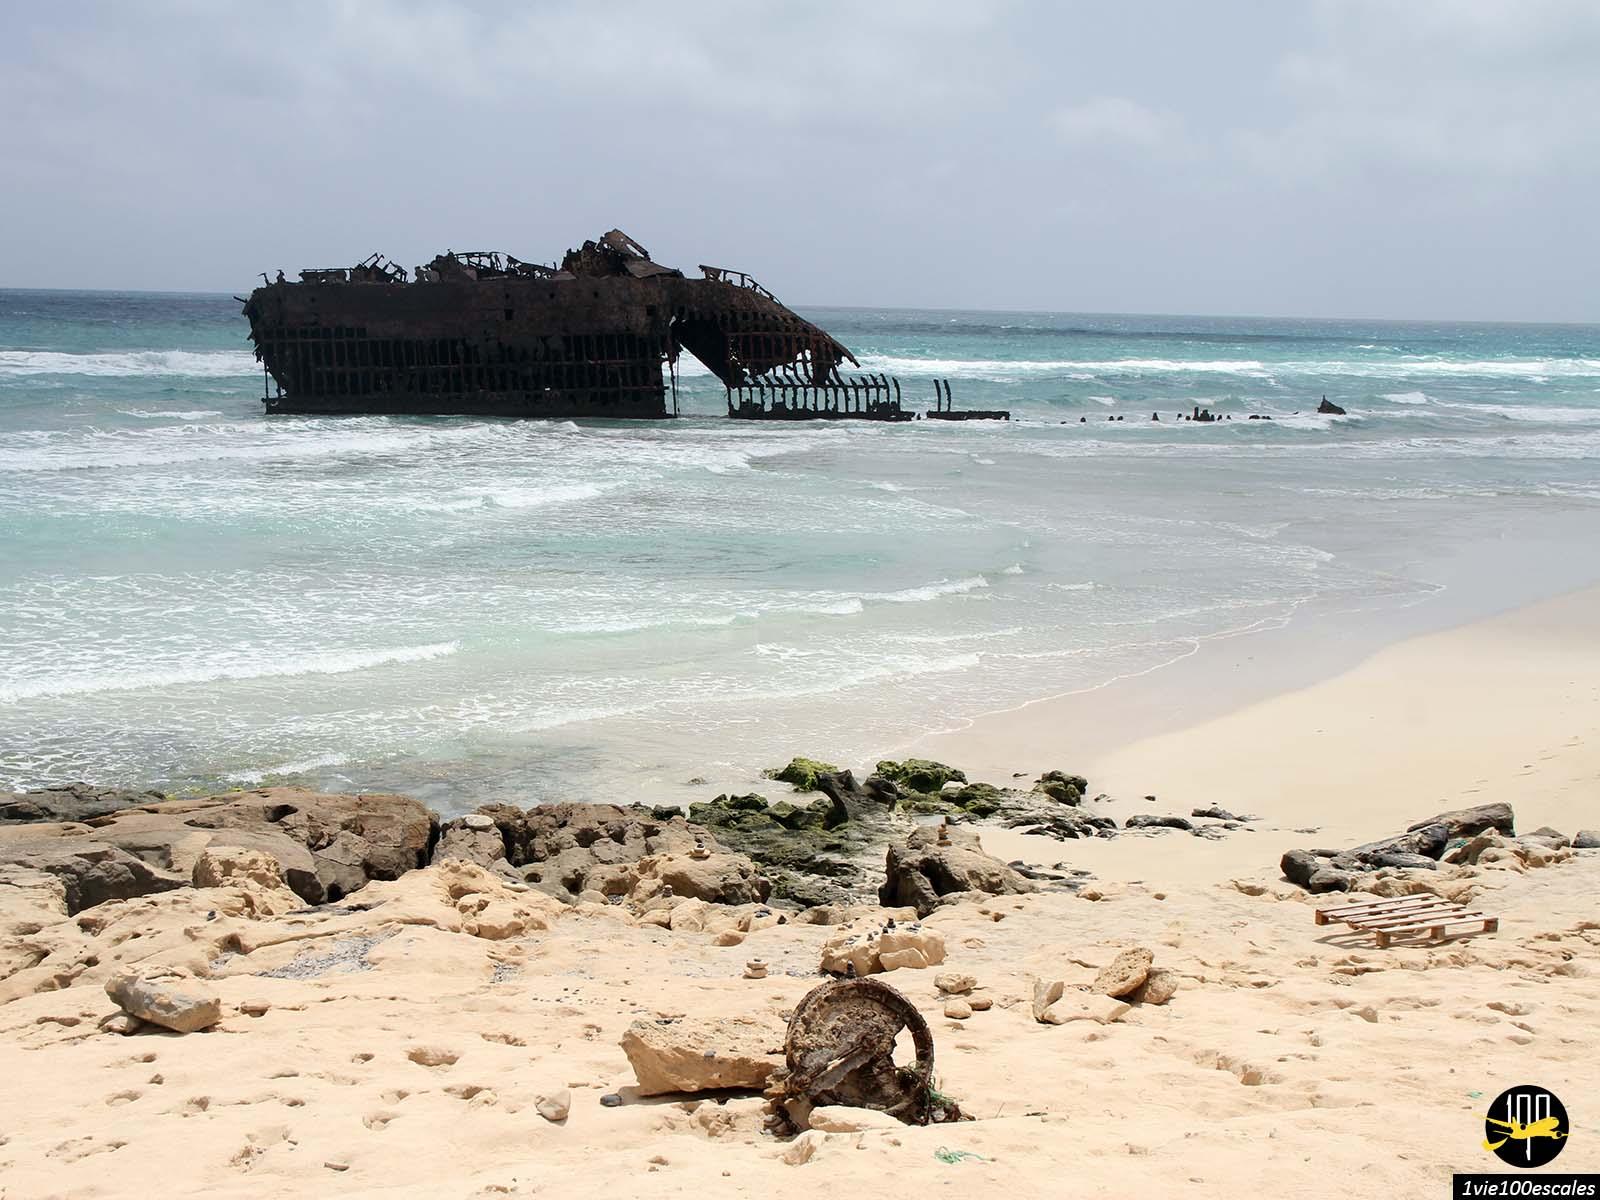 L'épave du Cabo Santa Maria de l'île de Boa Vista au Cap-Vert